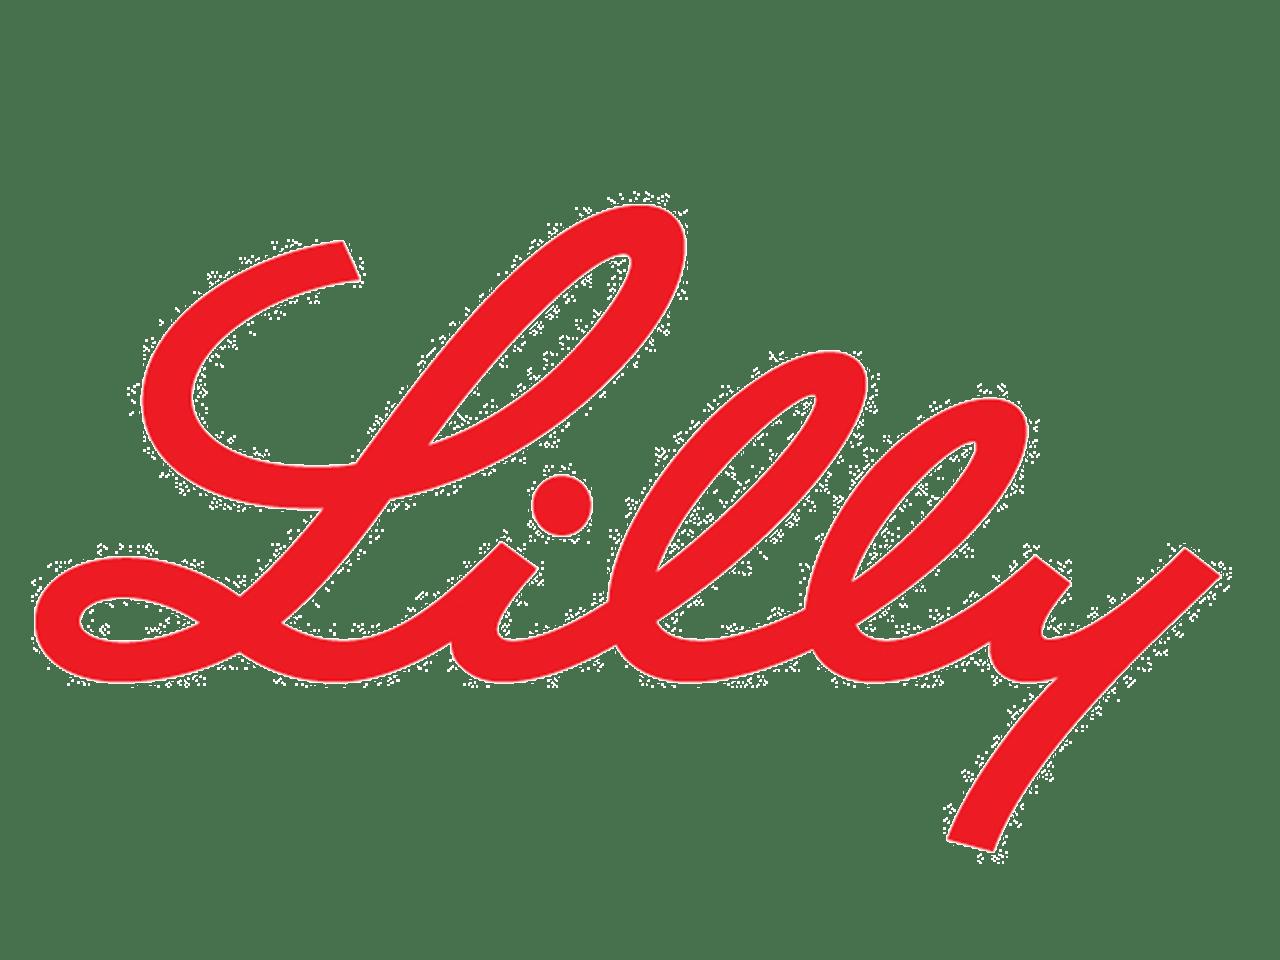 ELI LILLY OTS_1551725900692.png.jpg